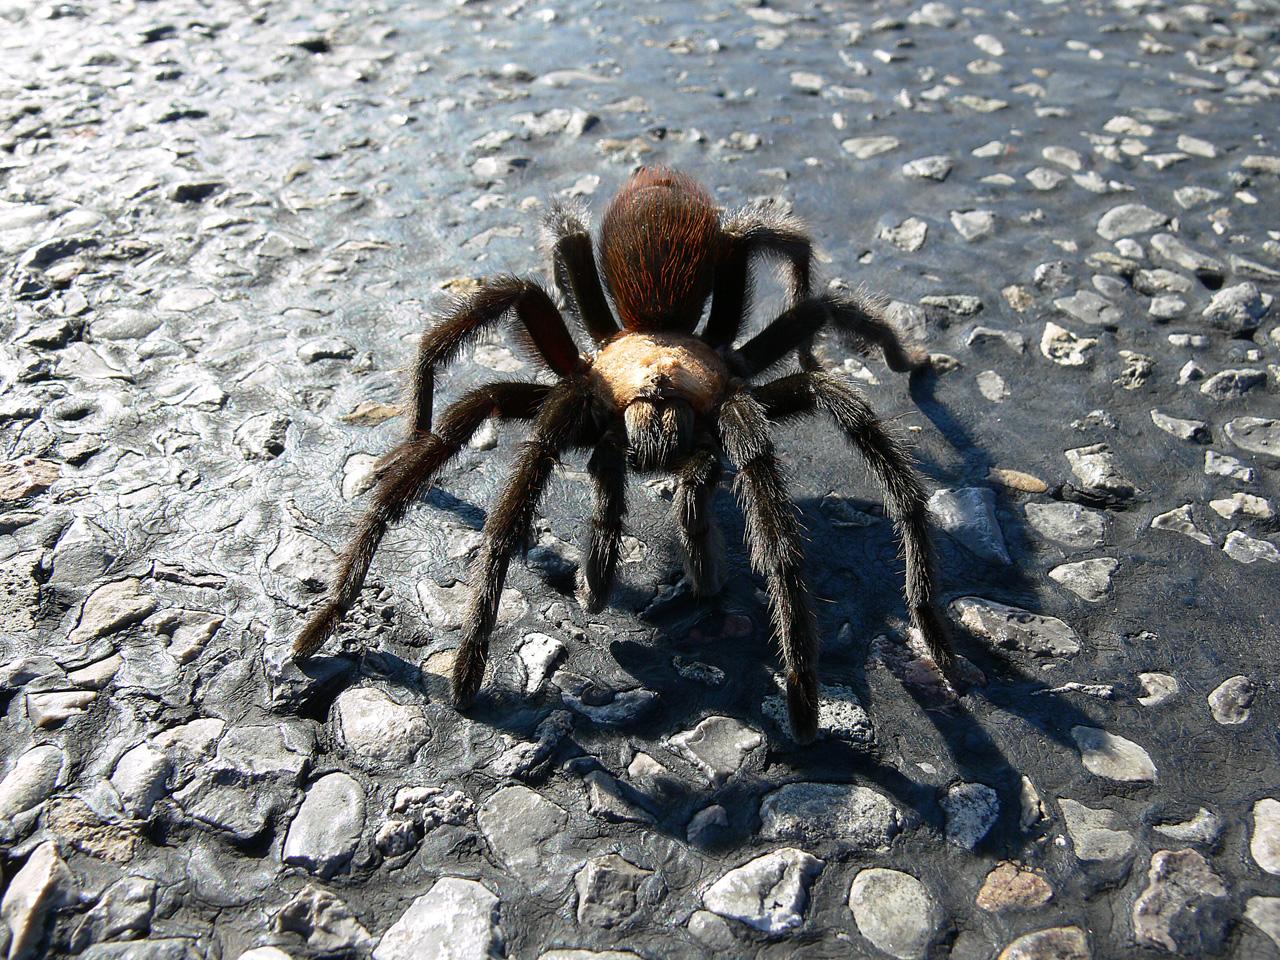 Pet tarantula on face - photo#22